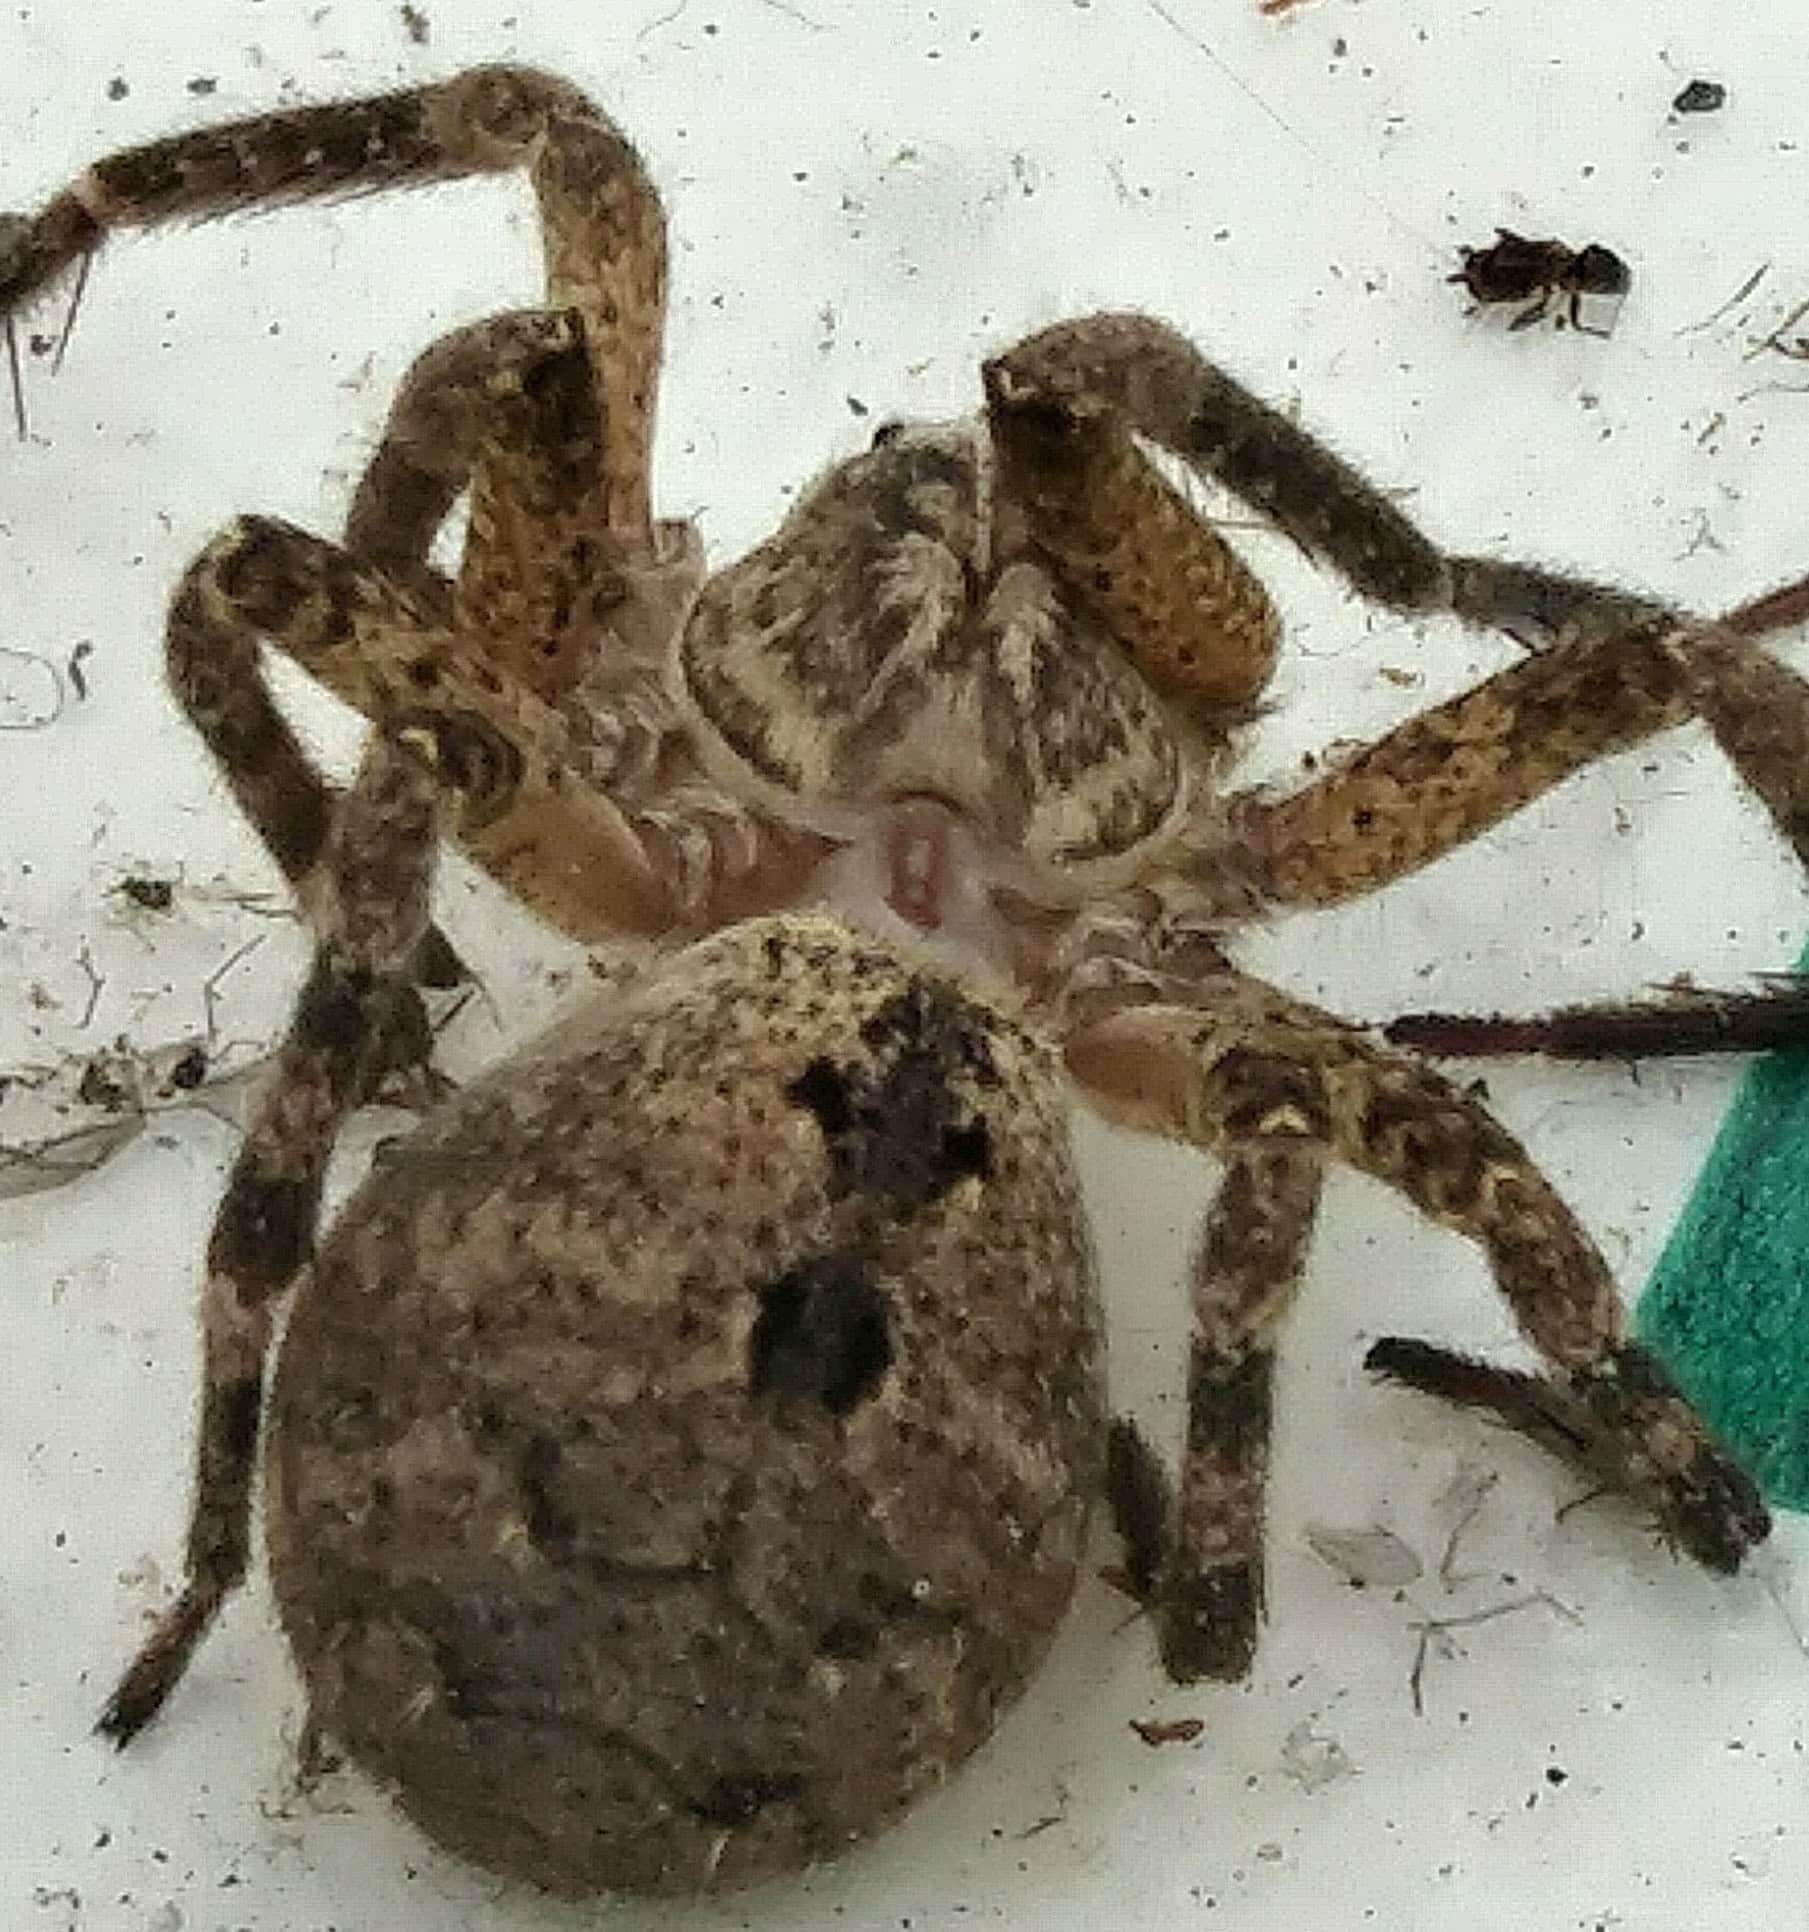 Picture of Zoropsis spinimana - Dorsal